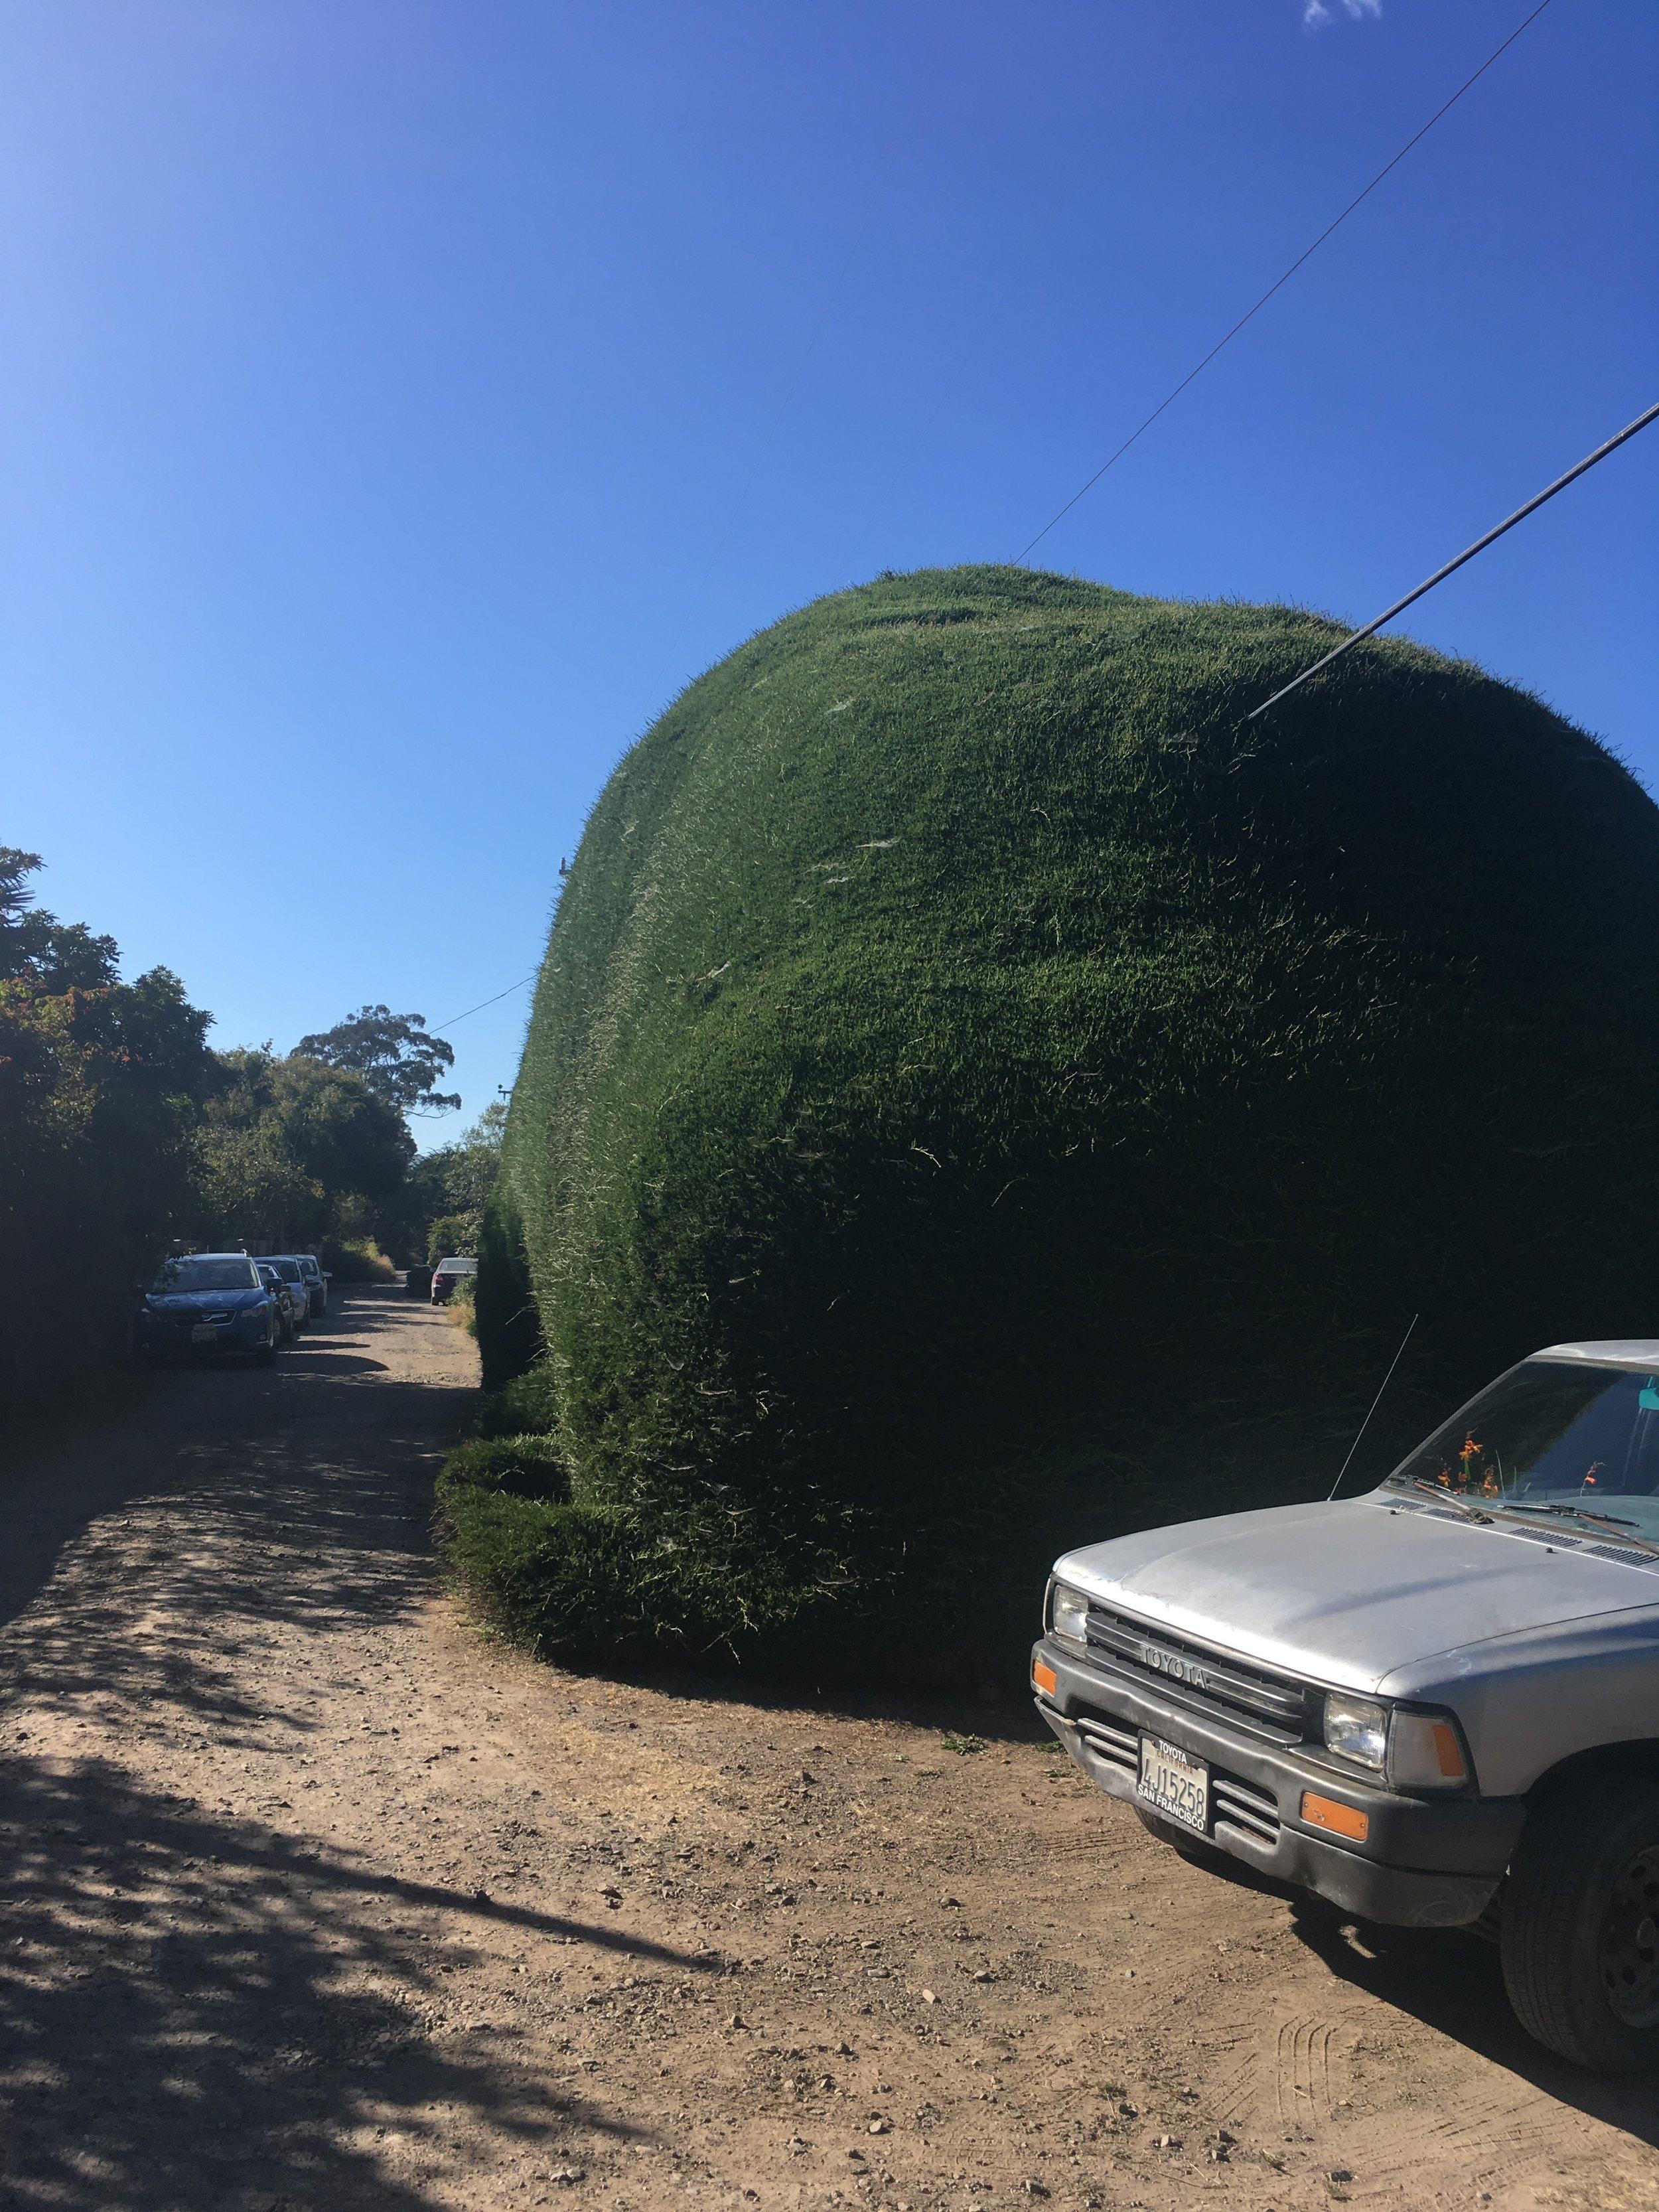 Manatee Bush Evergreen Street.jpg